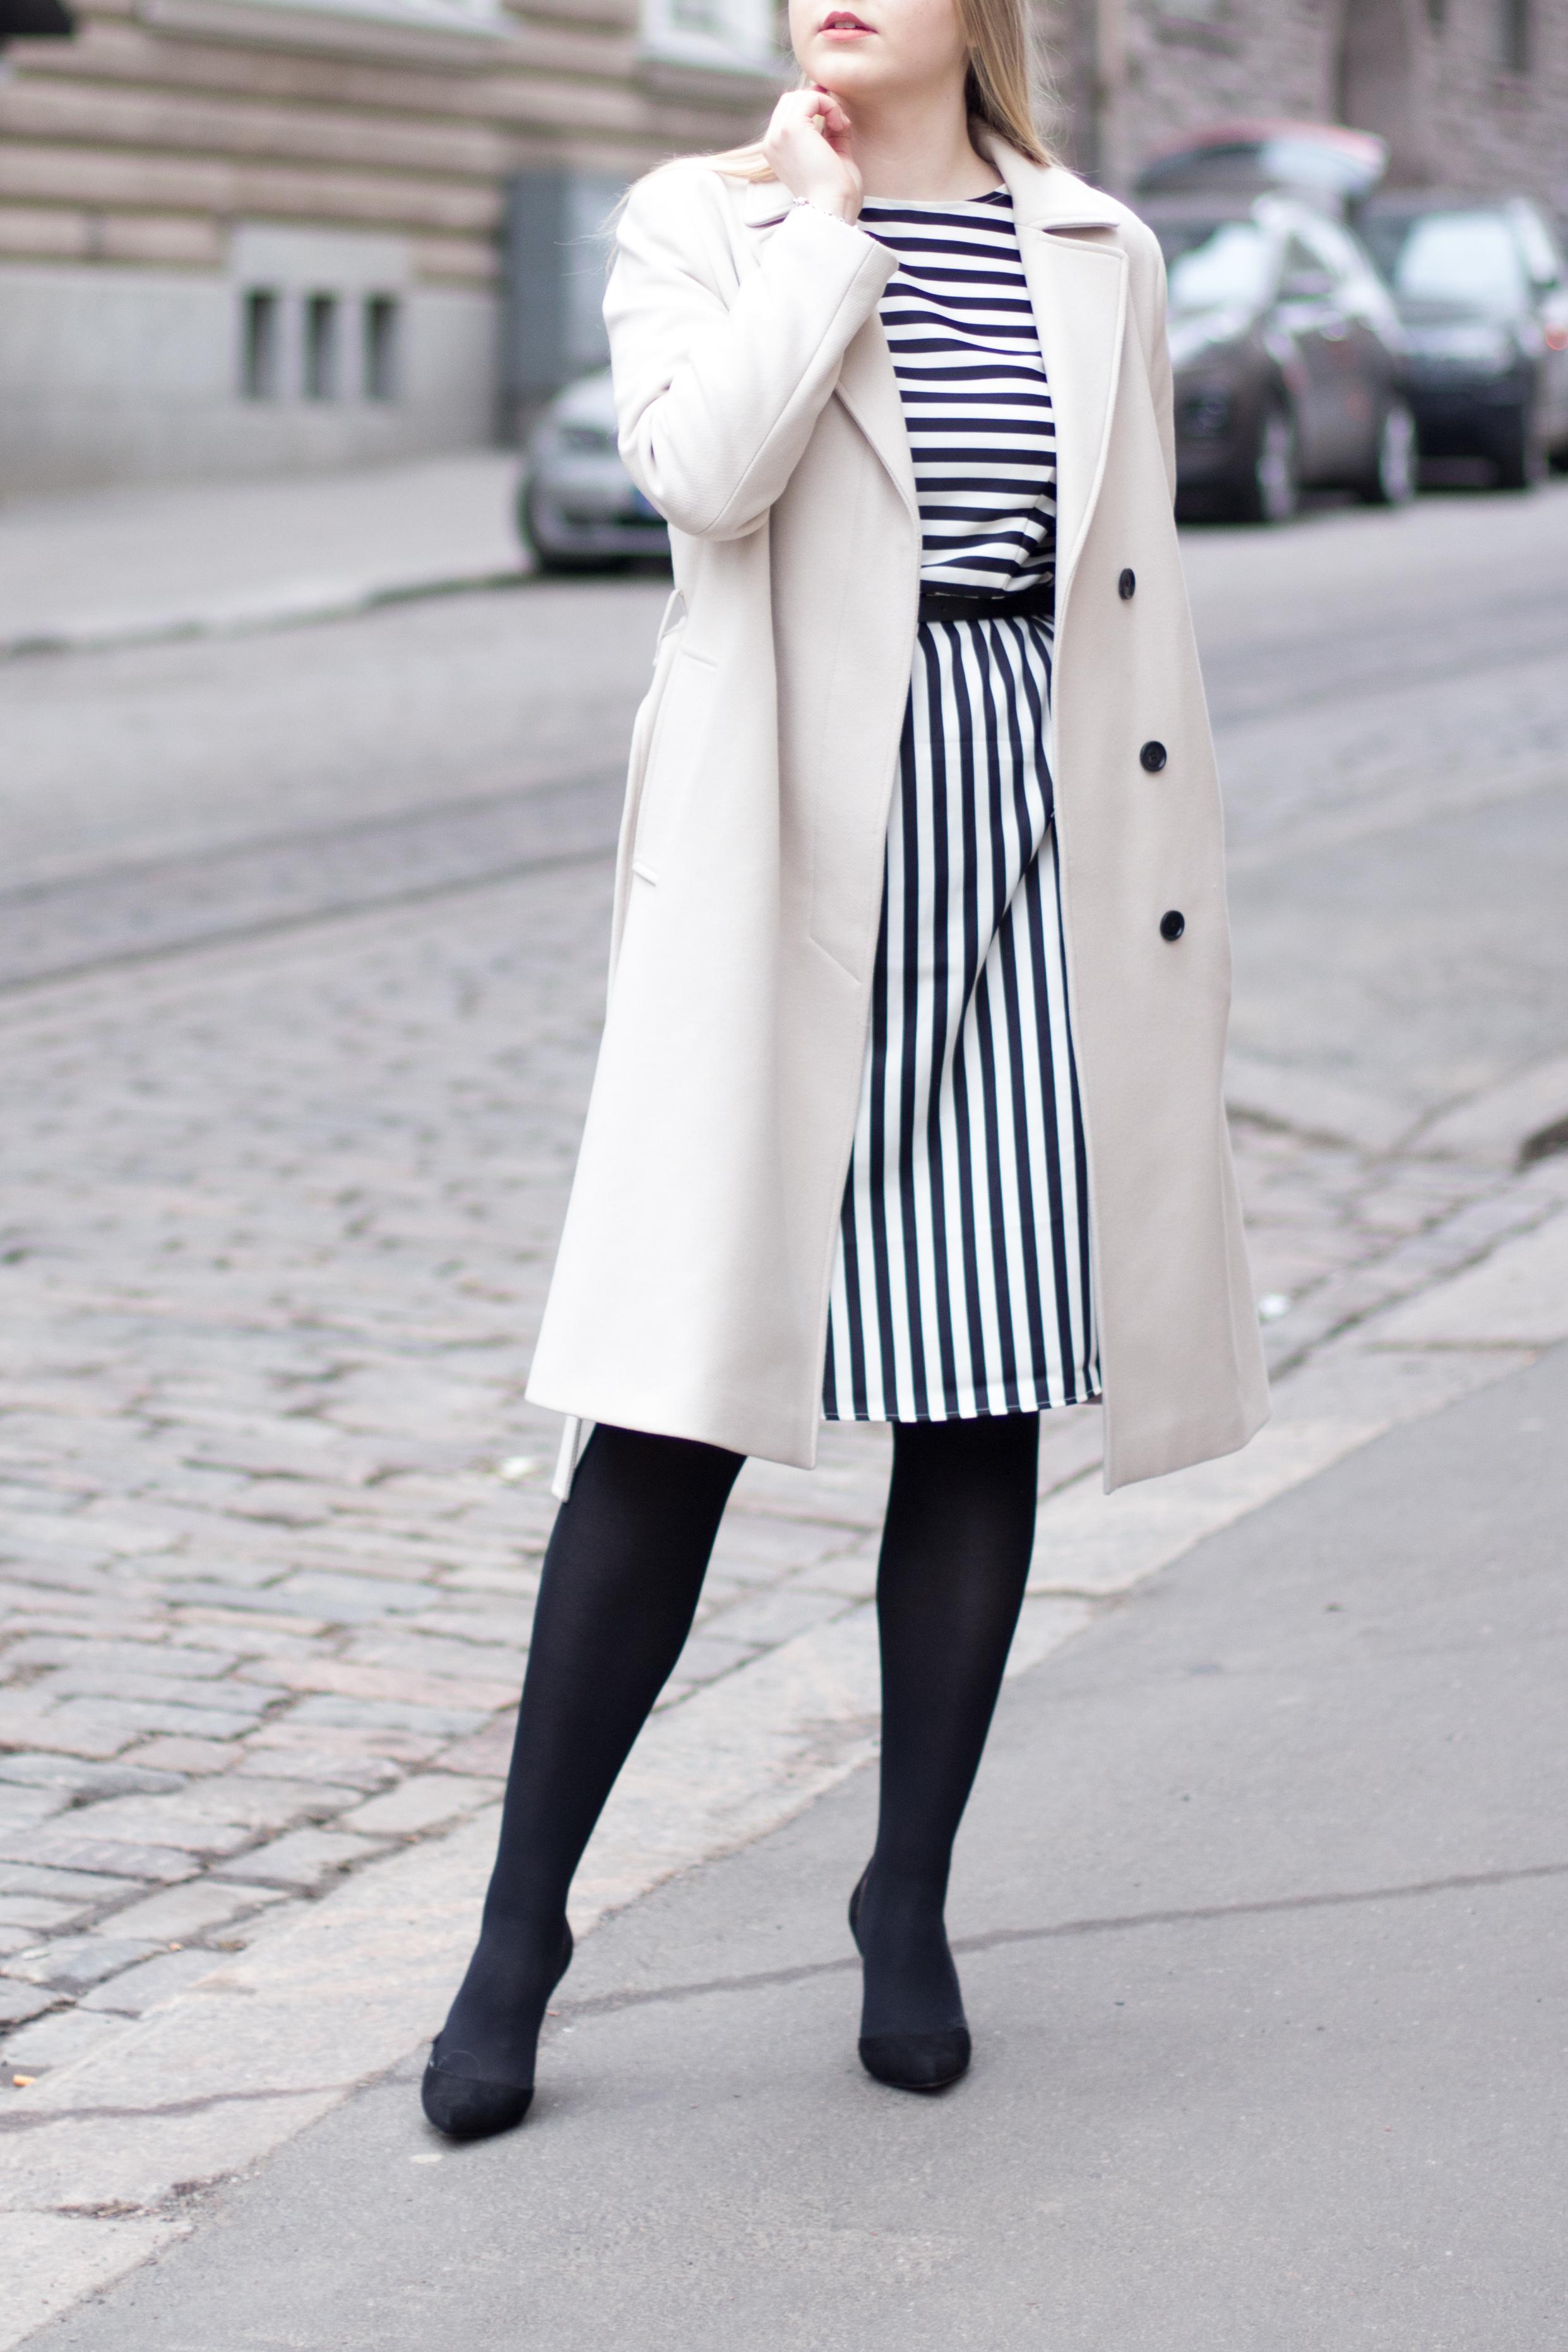 black and white dress (1 of 13).jpg